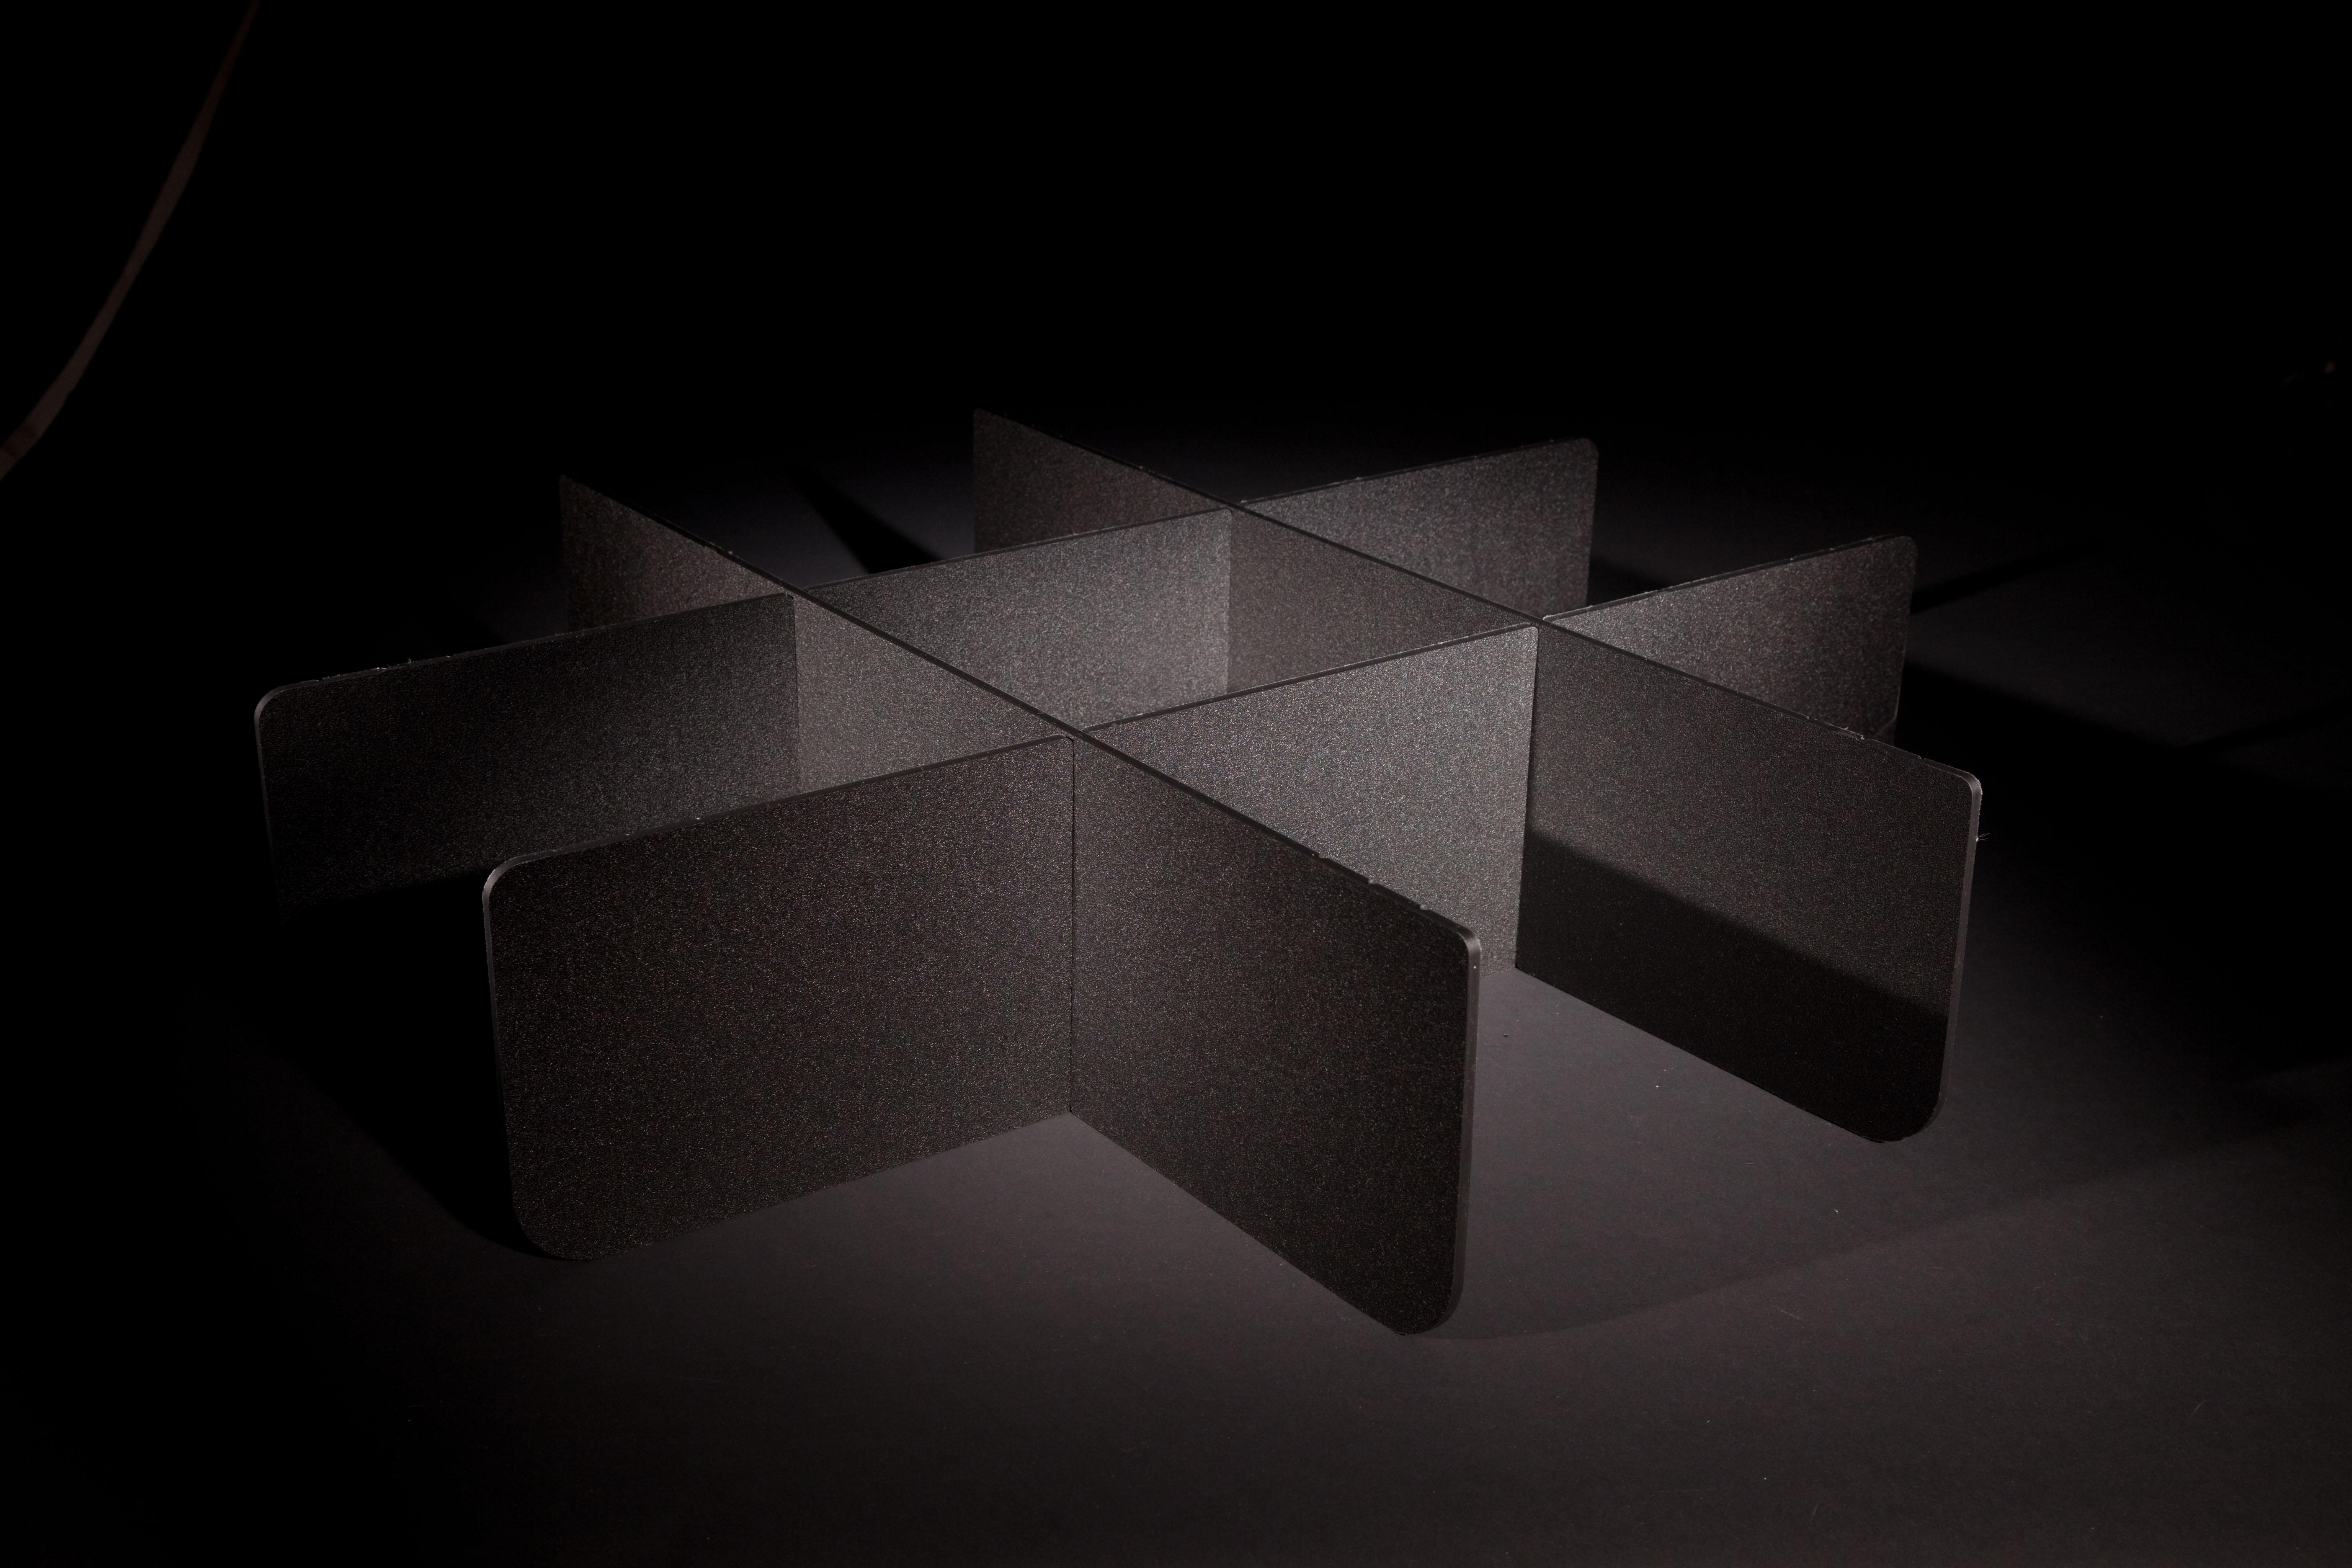 center box divide it resized